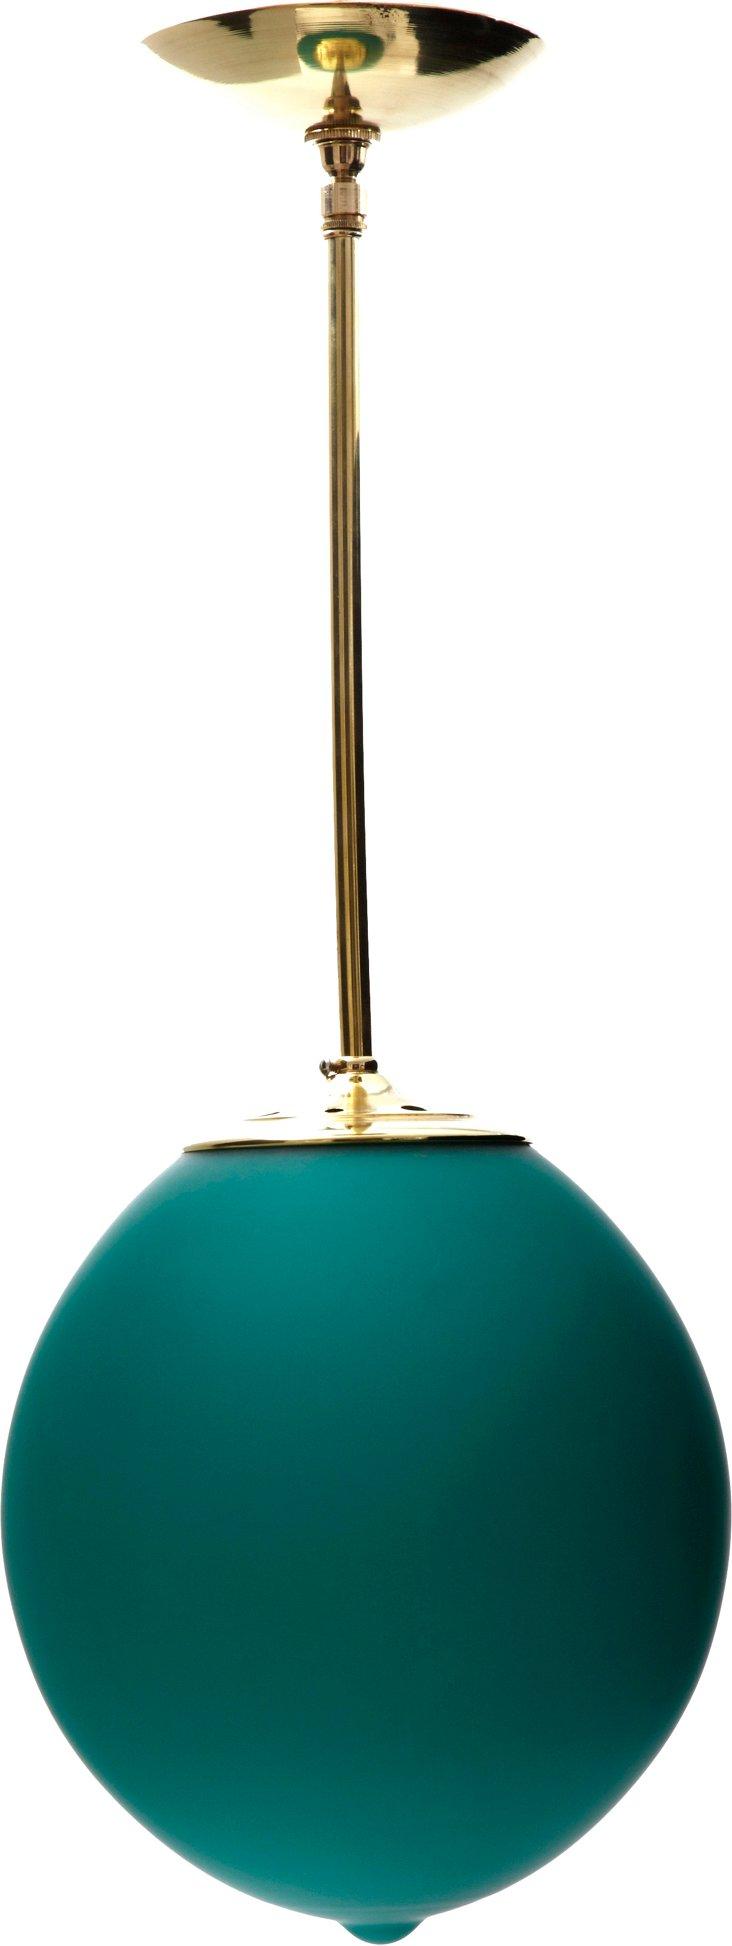 Murano Glass Balloon Pendant